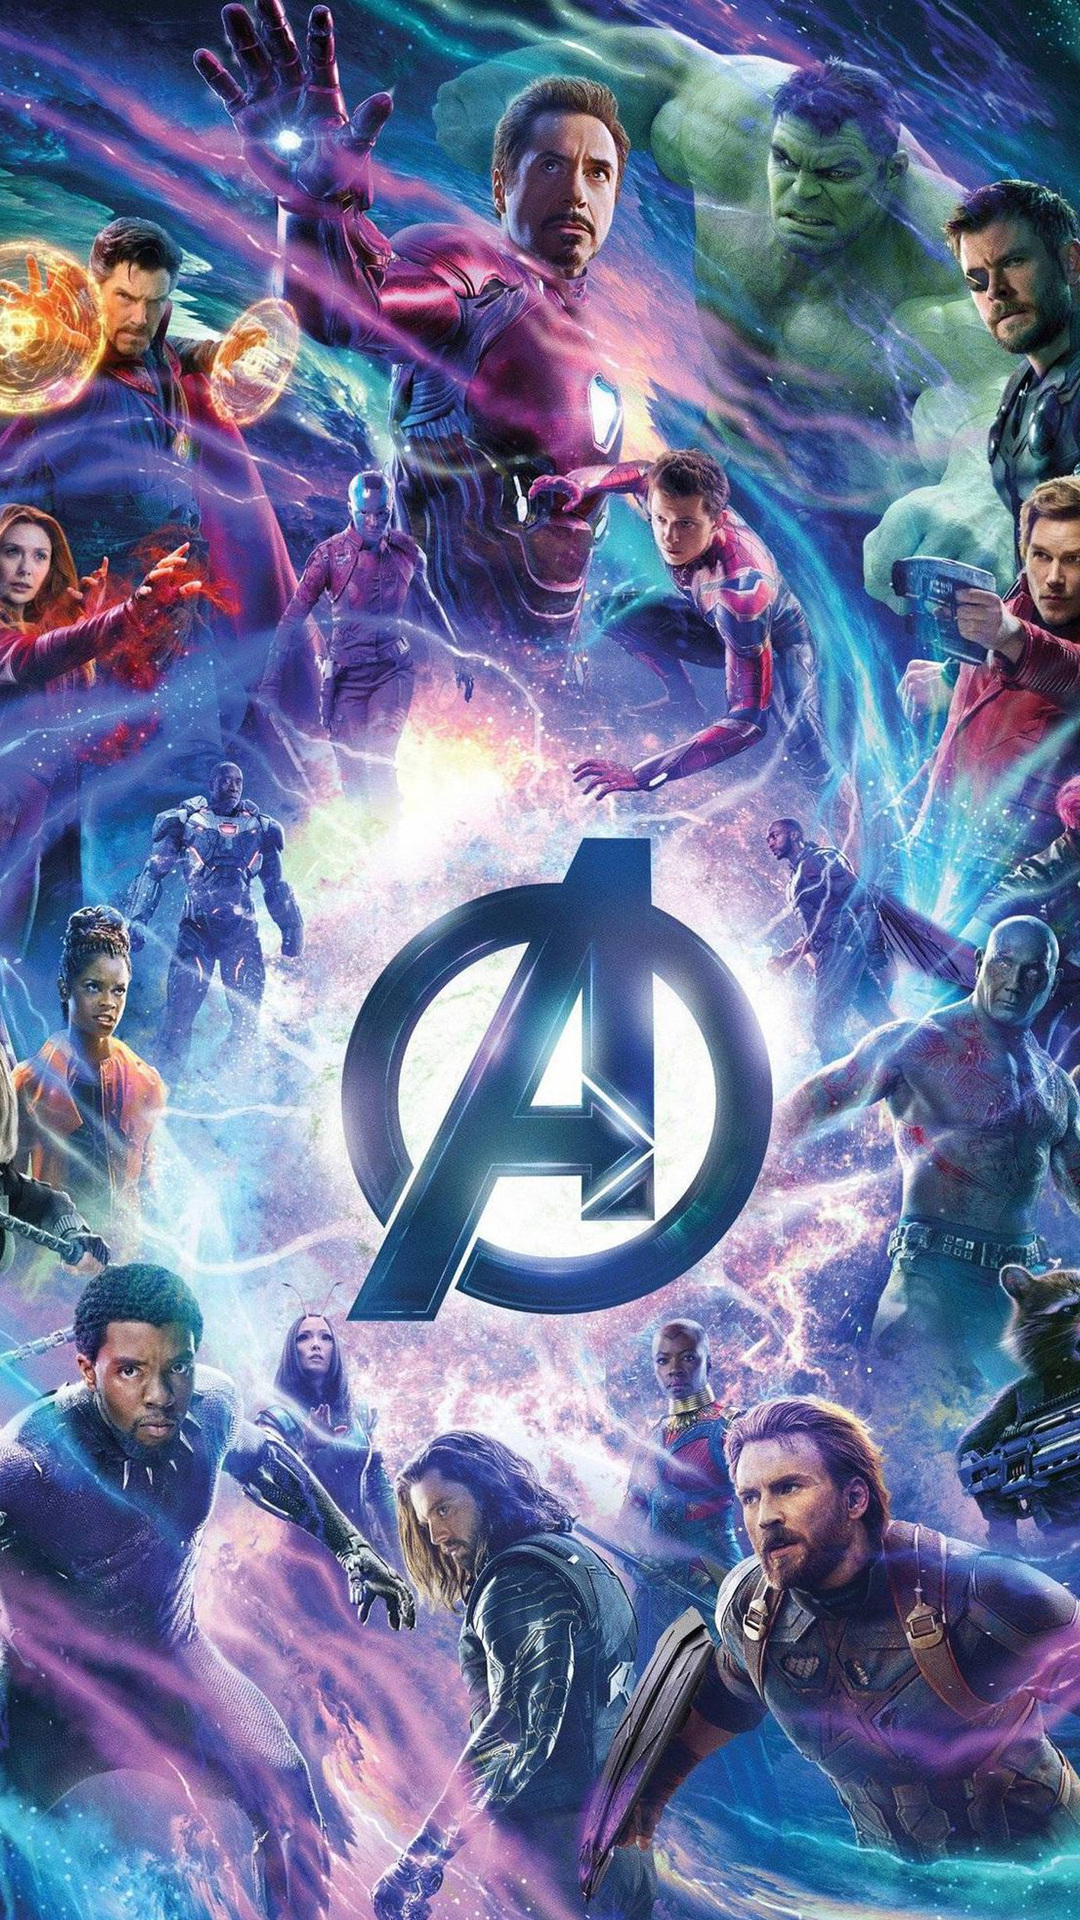 1080x1920 Avengers Infinity War Movie Bill Poster Iphone 7 ...